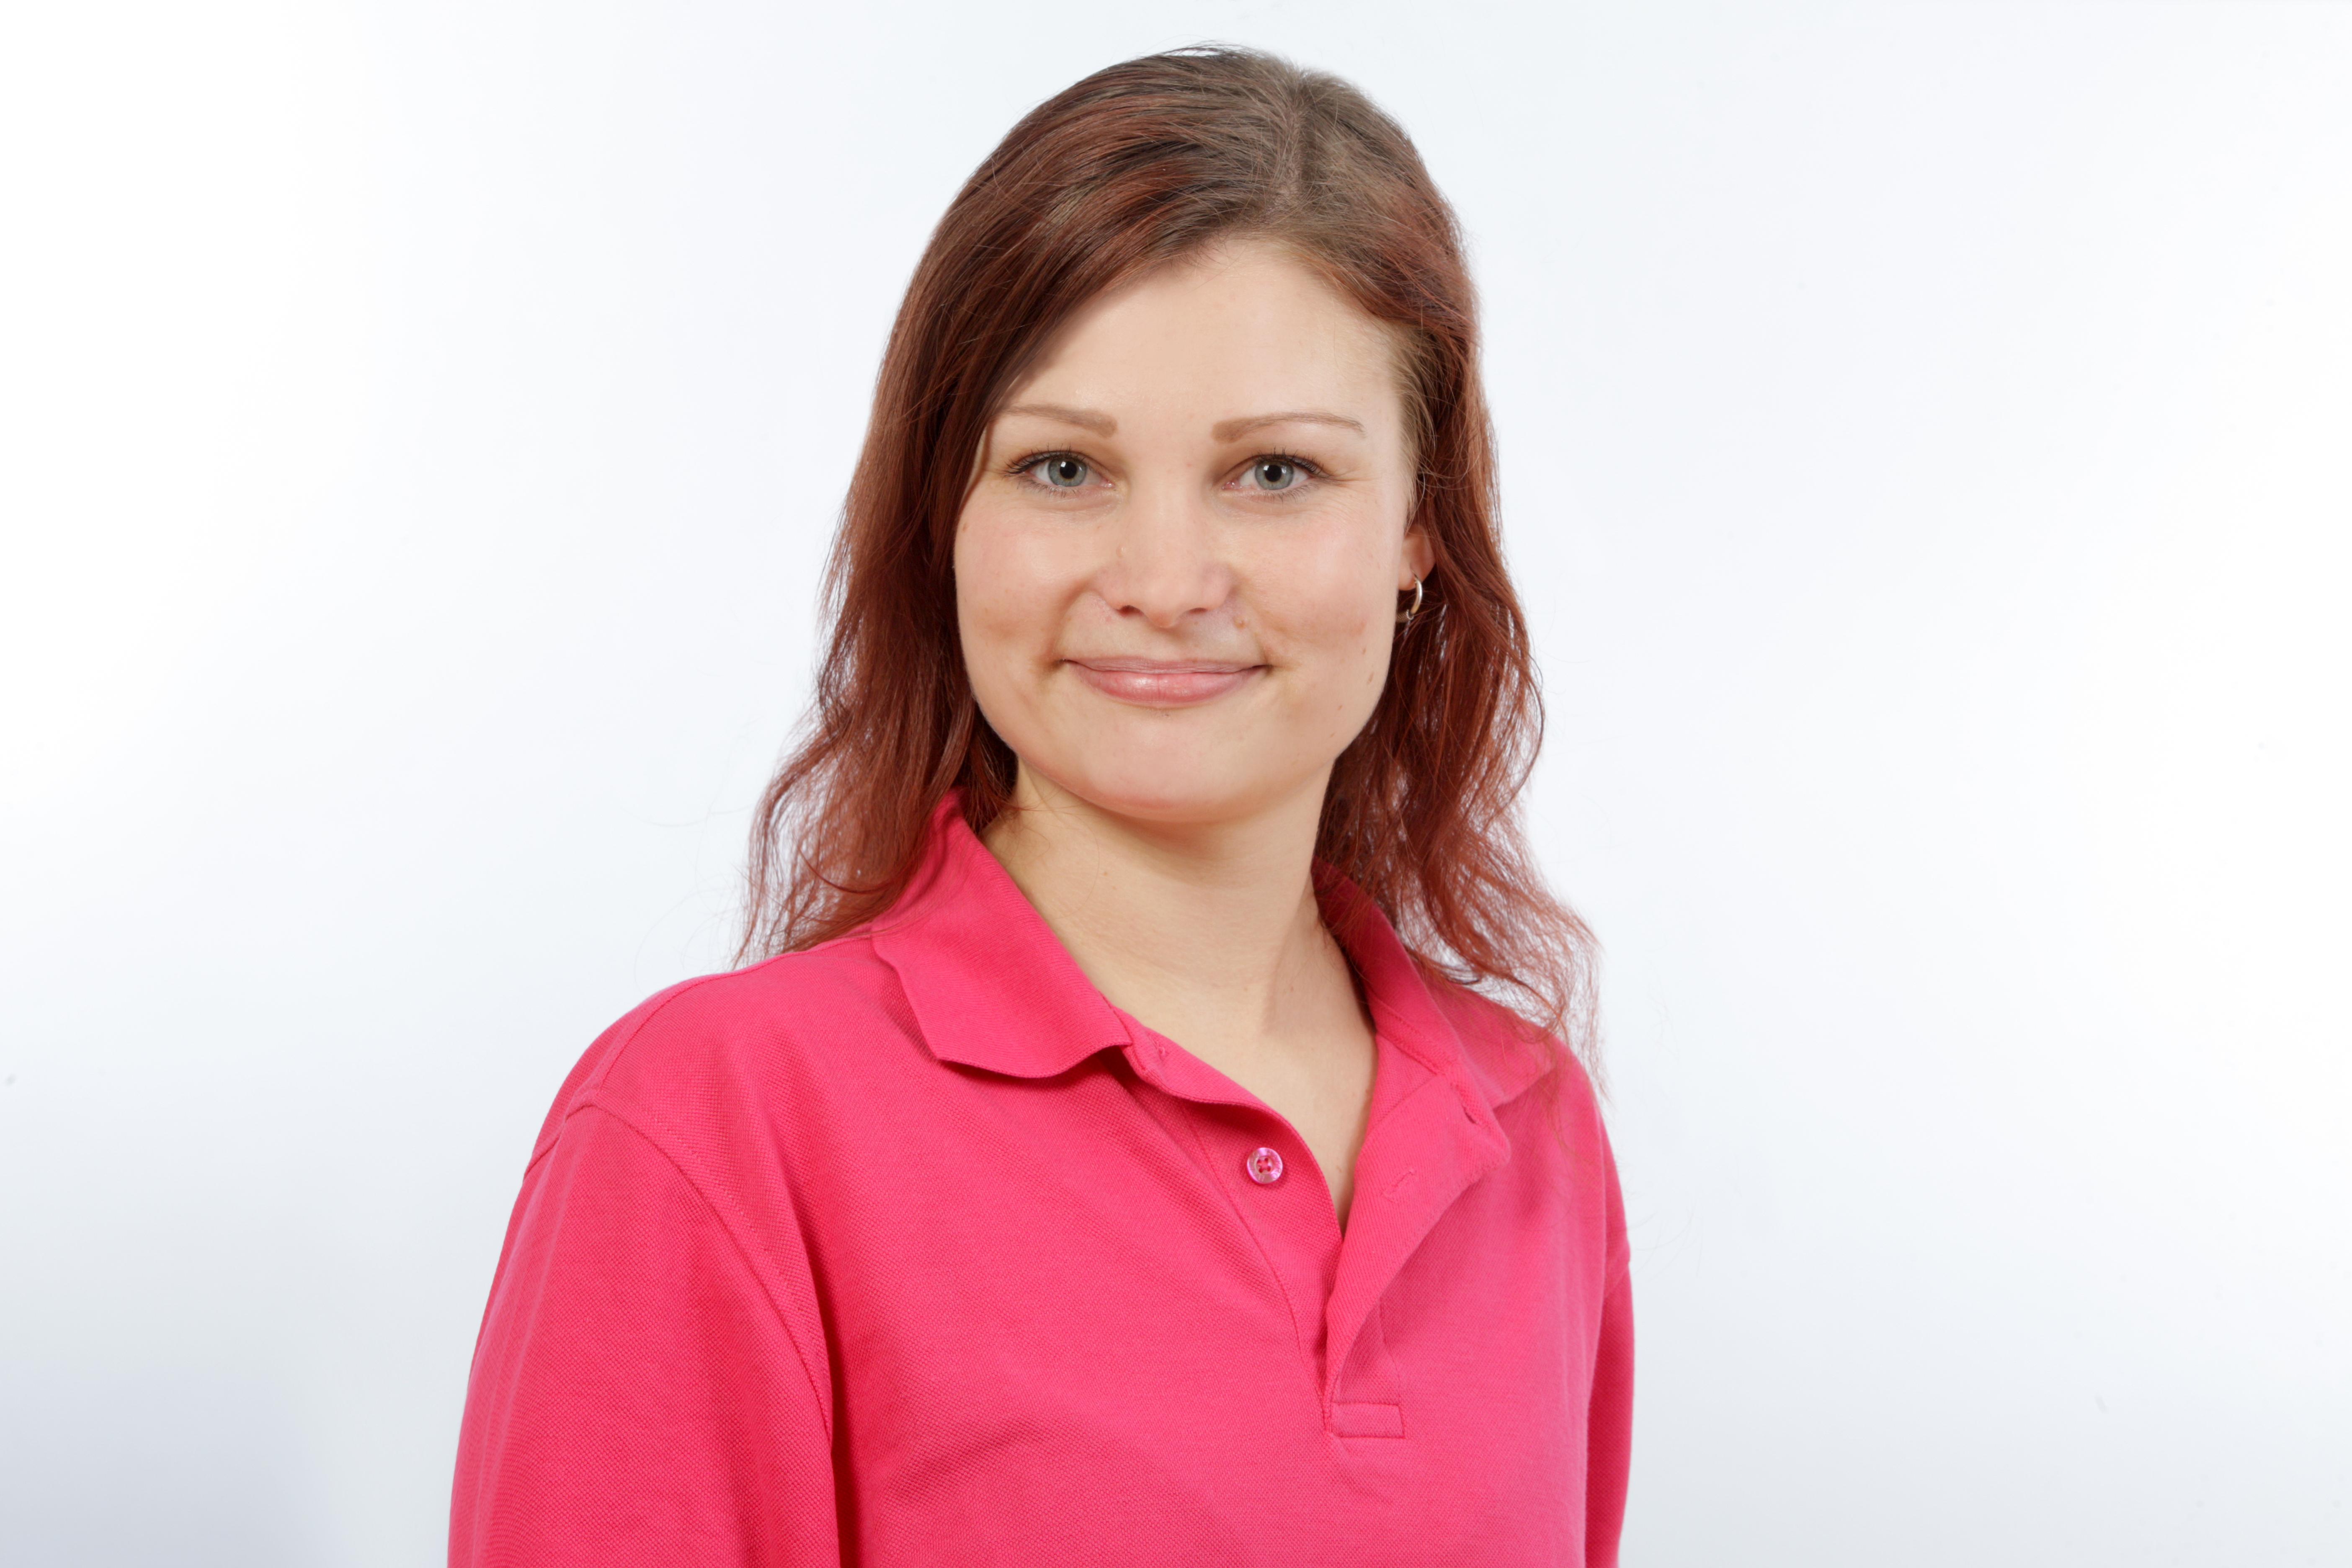 Cora Höfer